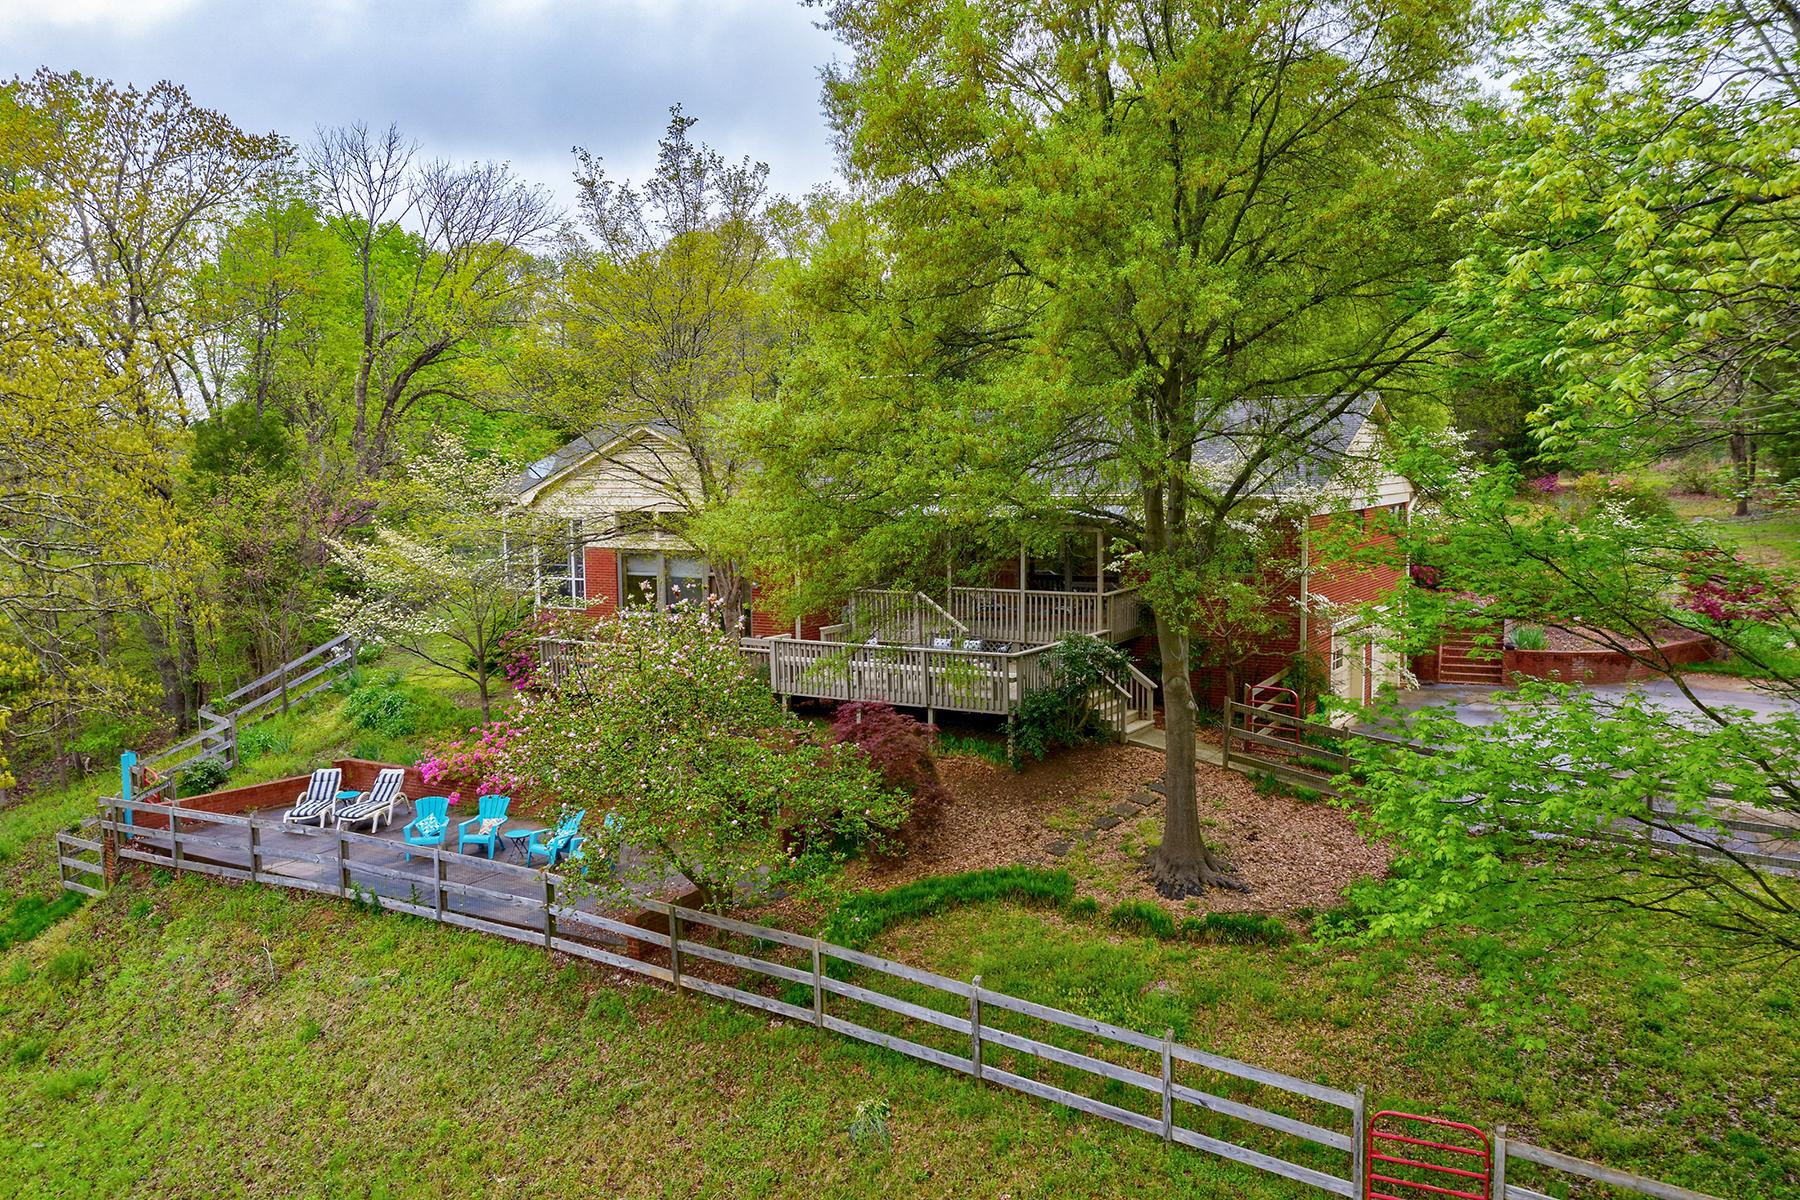 Single Family Homes για την Πώληση στο 8700 Dixie Dr, Charlotte, Βορεια Καρολινα 28278 Ηνωμένες Πολιτείες